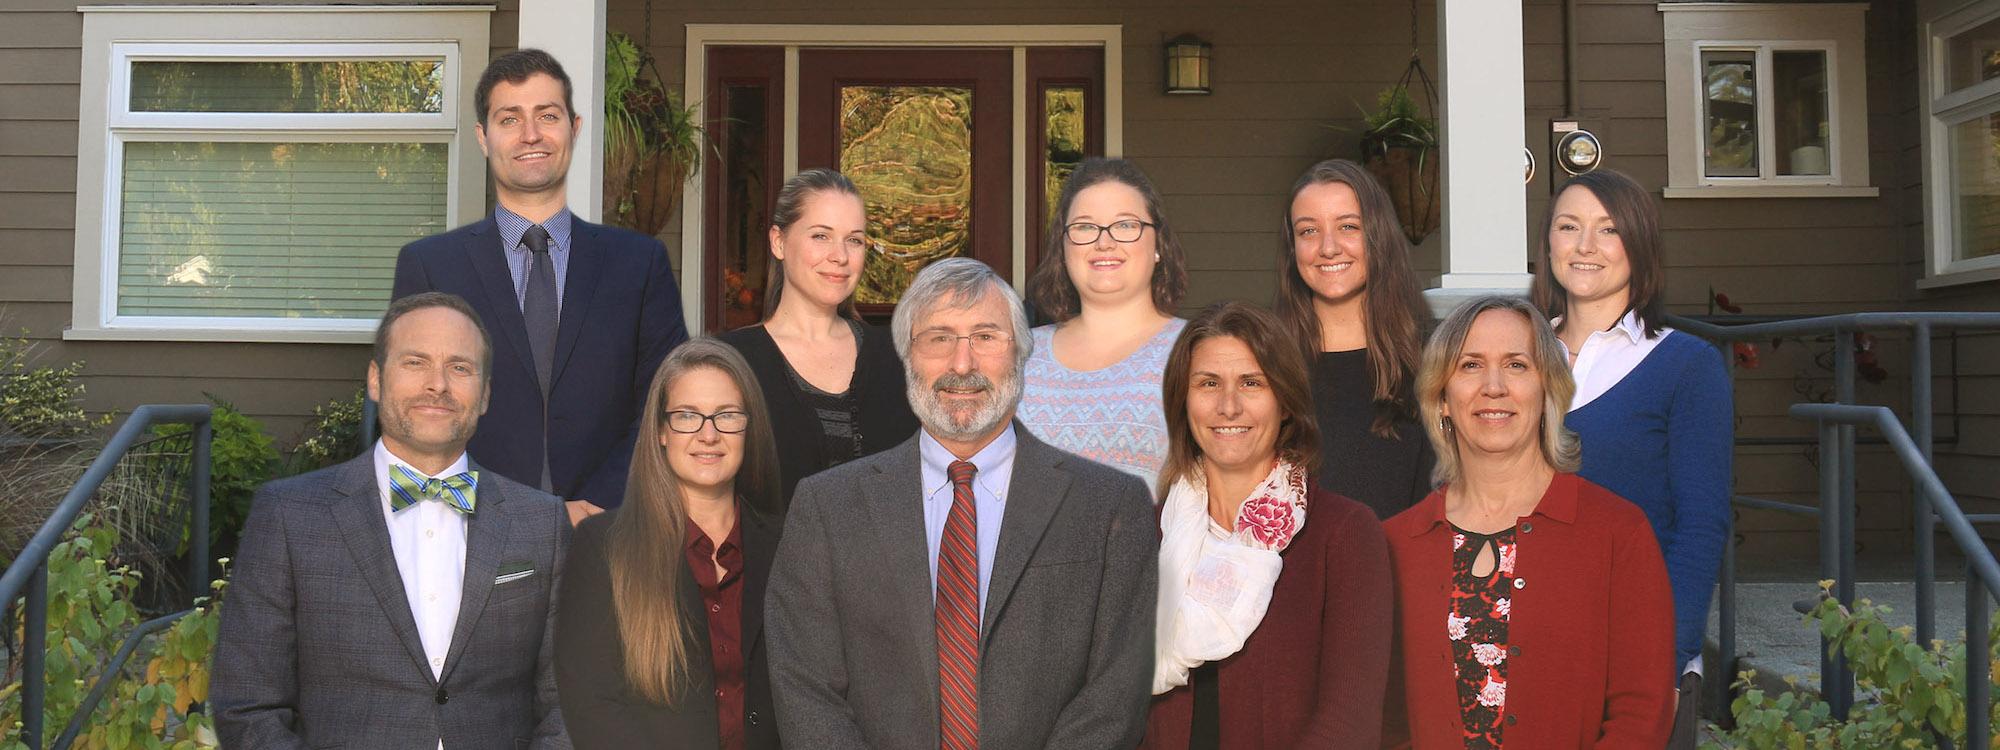 Elder Law Offices of Meyers, Neubeck & Hulford, P.S. | 1511 26th St, Everett, WA, 98201 | +1 (360) 647-8846